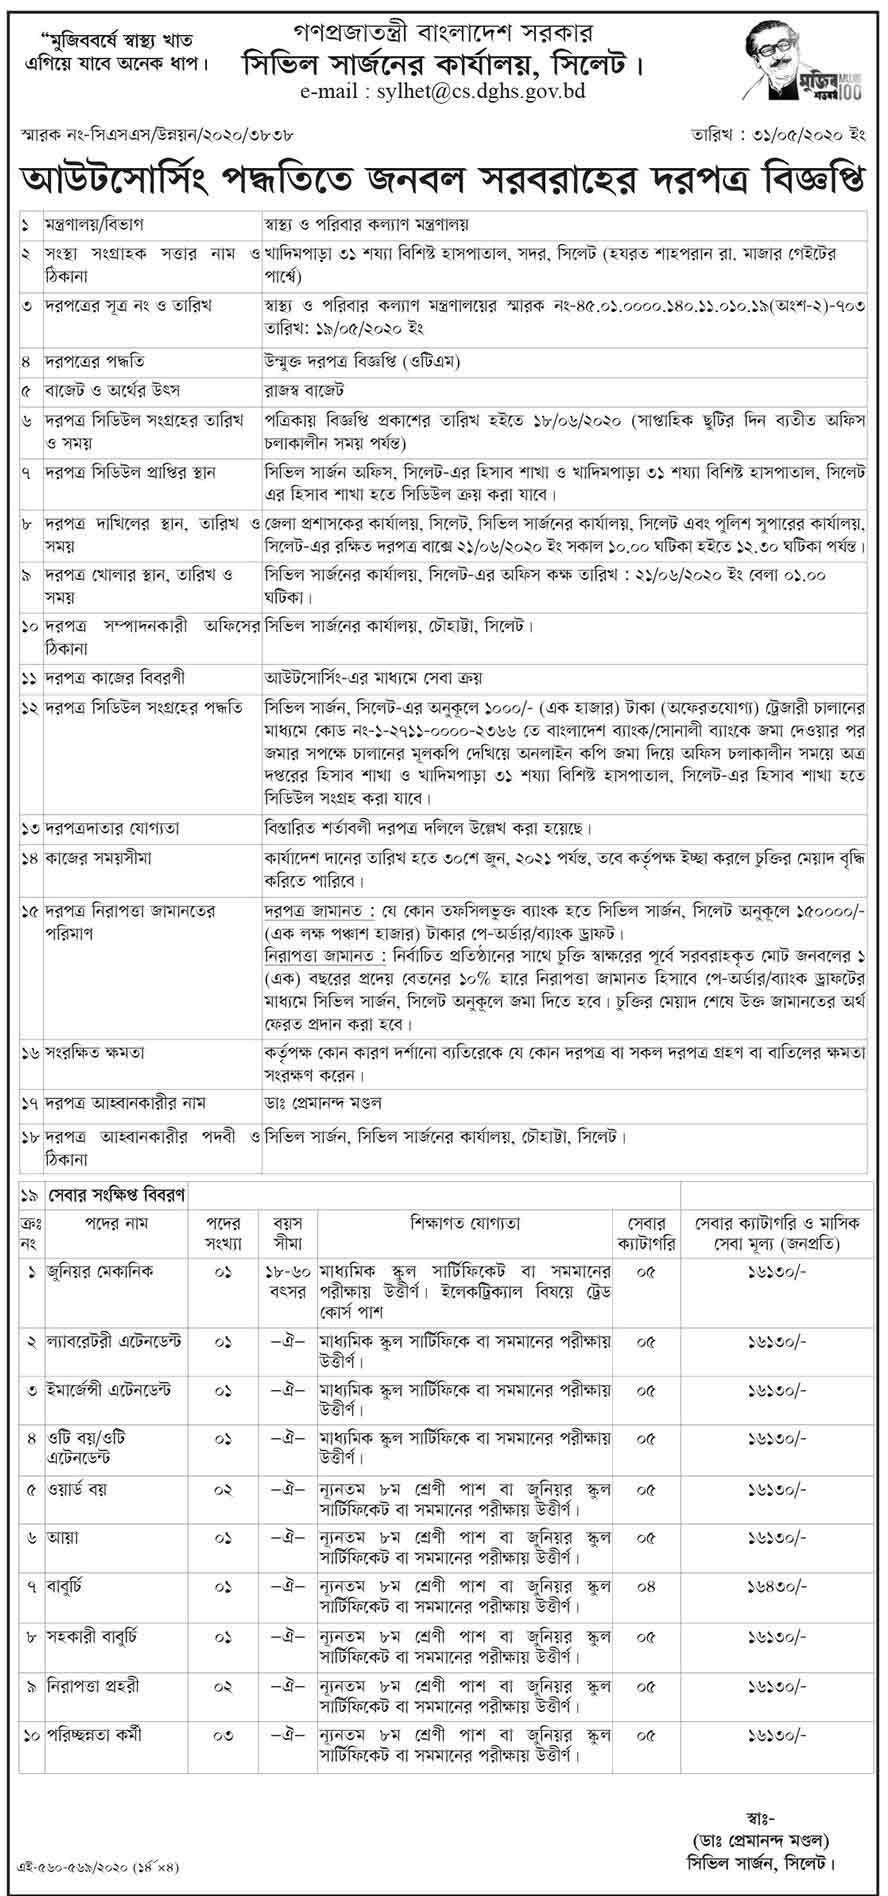 Civil Surgeon Office Sylhet Job circular 2020